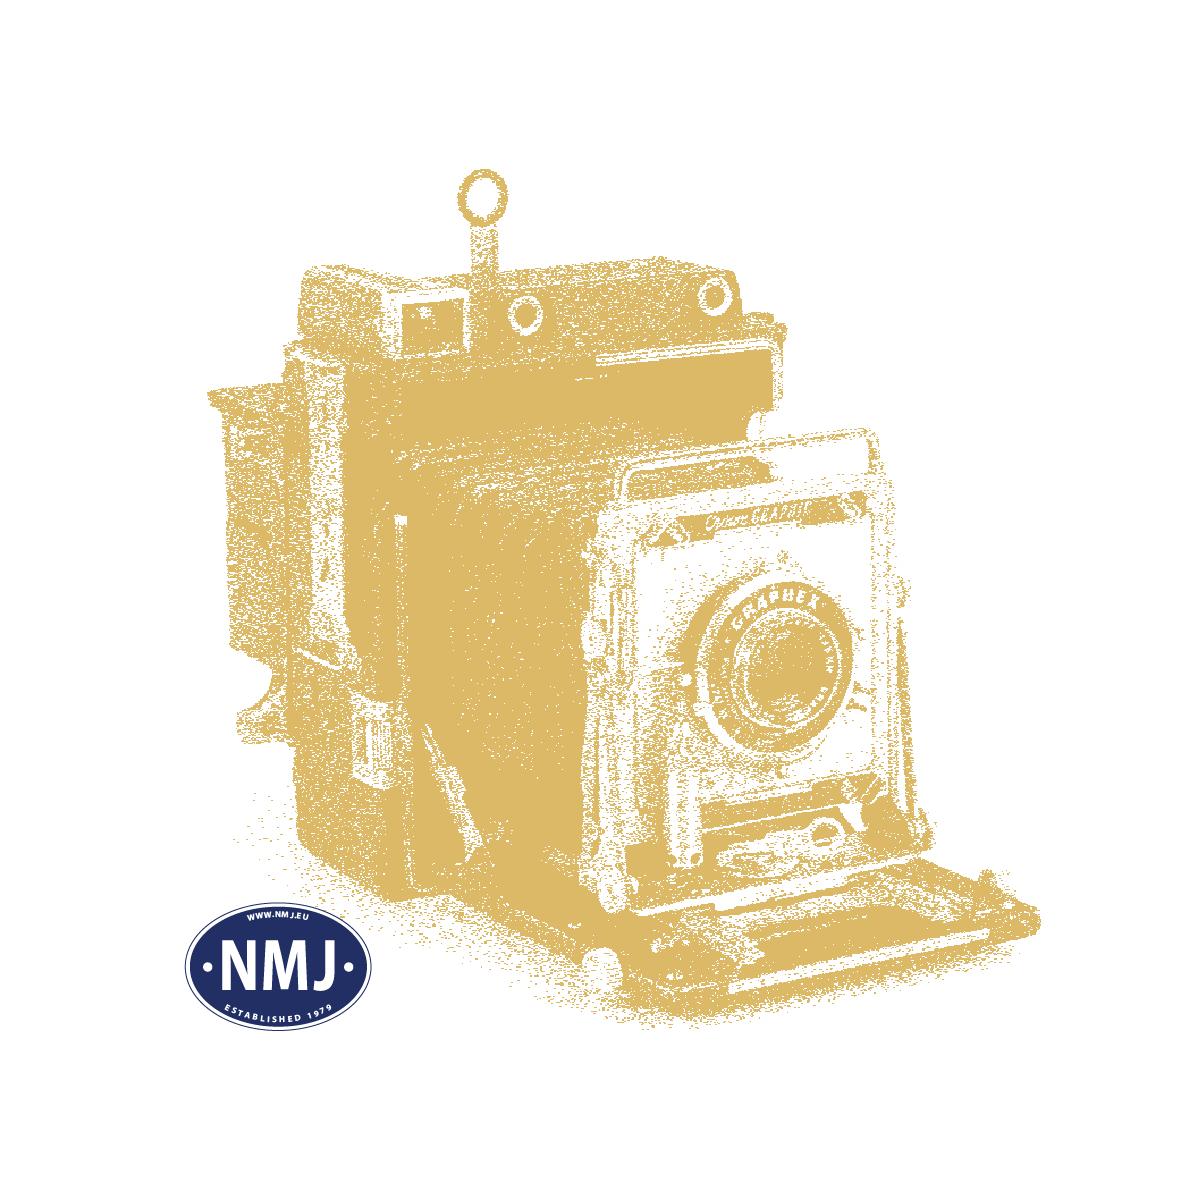 NMJT95304 - NMJ Topline CFL 1601 (1956-1971), AC m/ Lyd